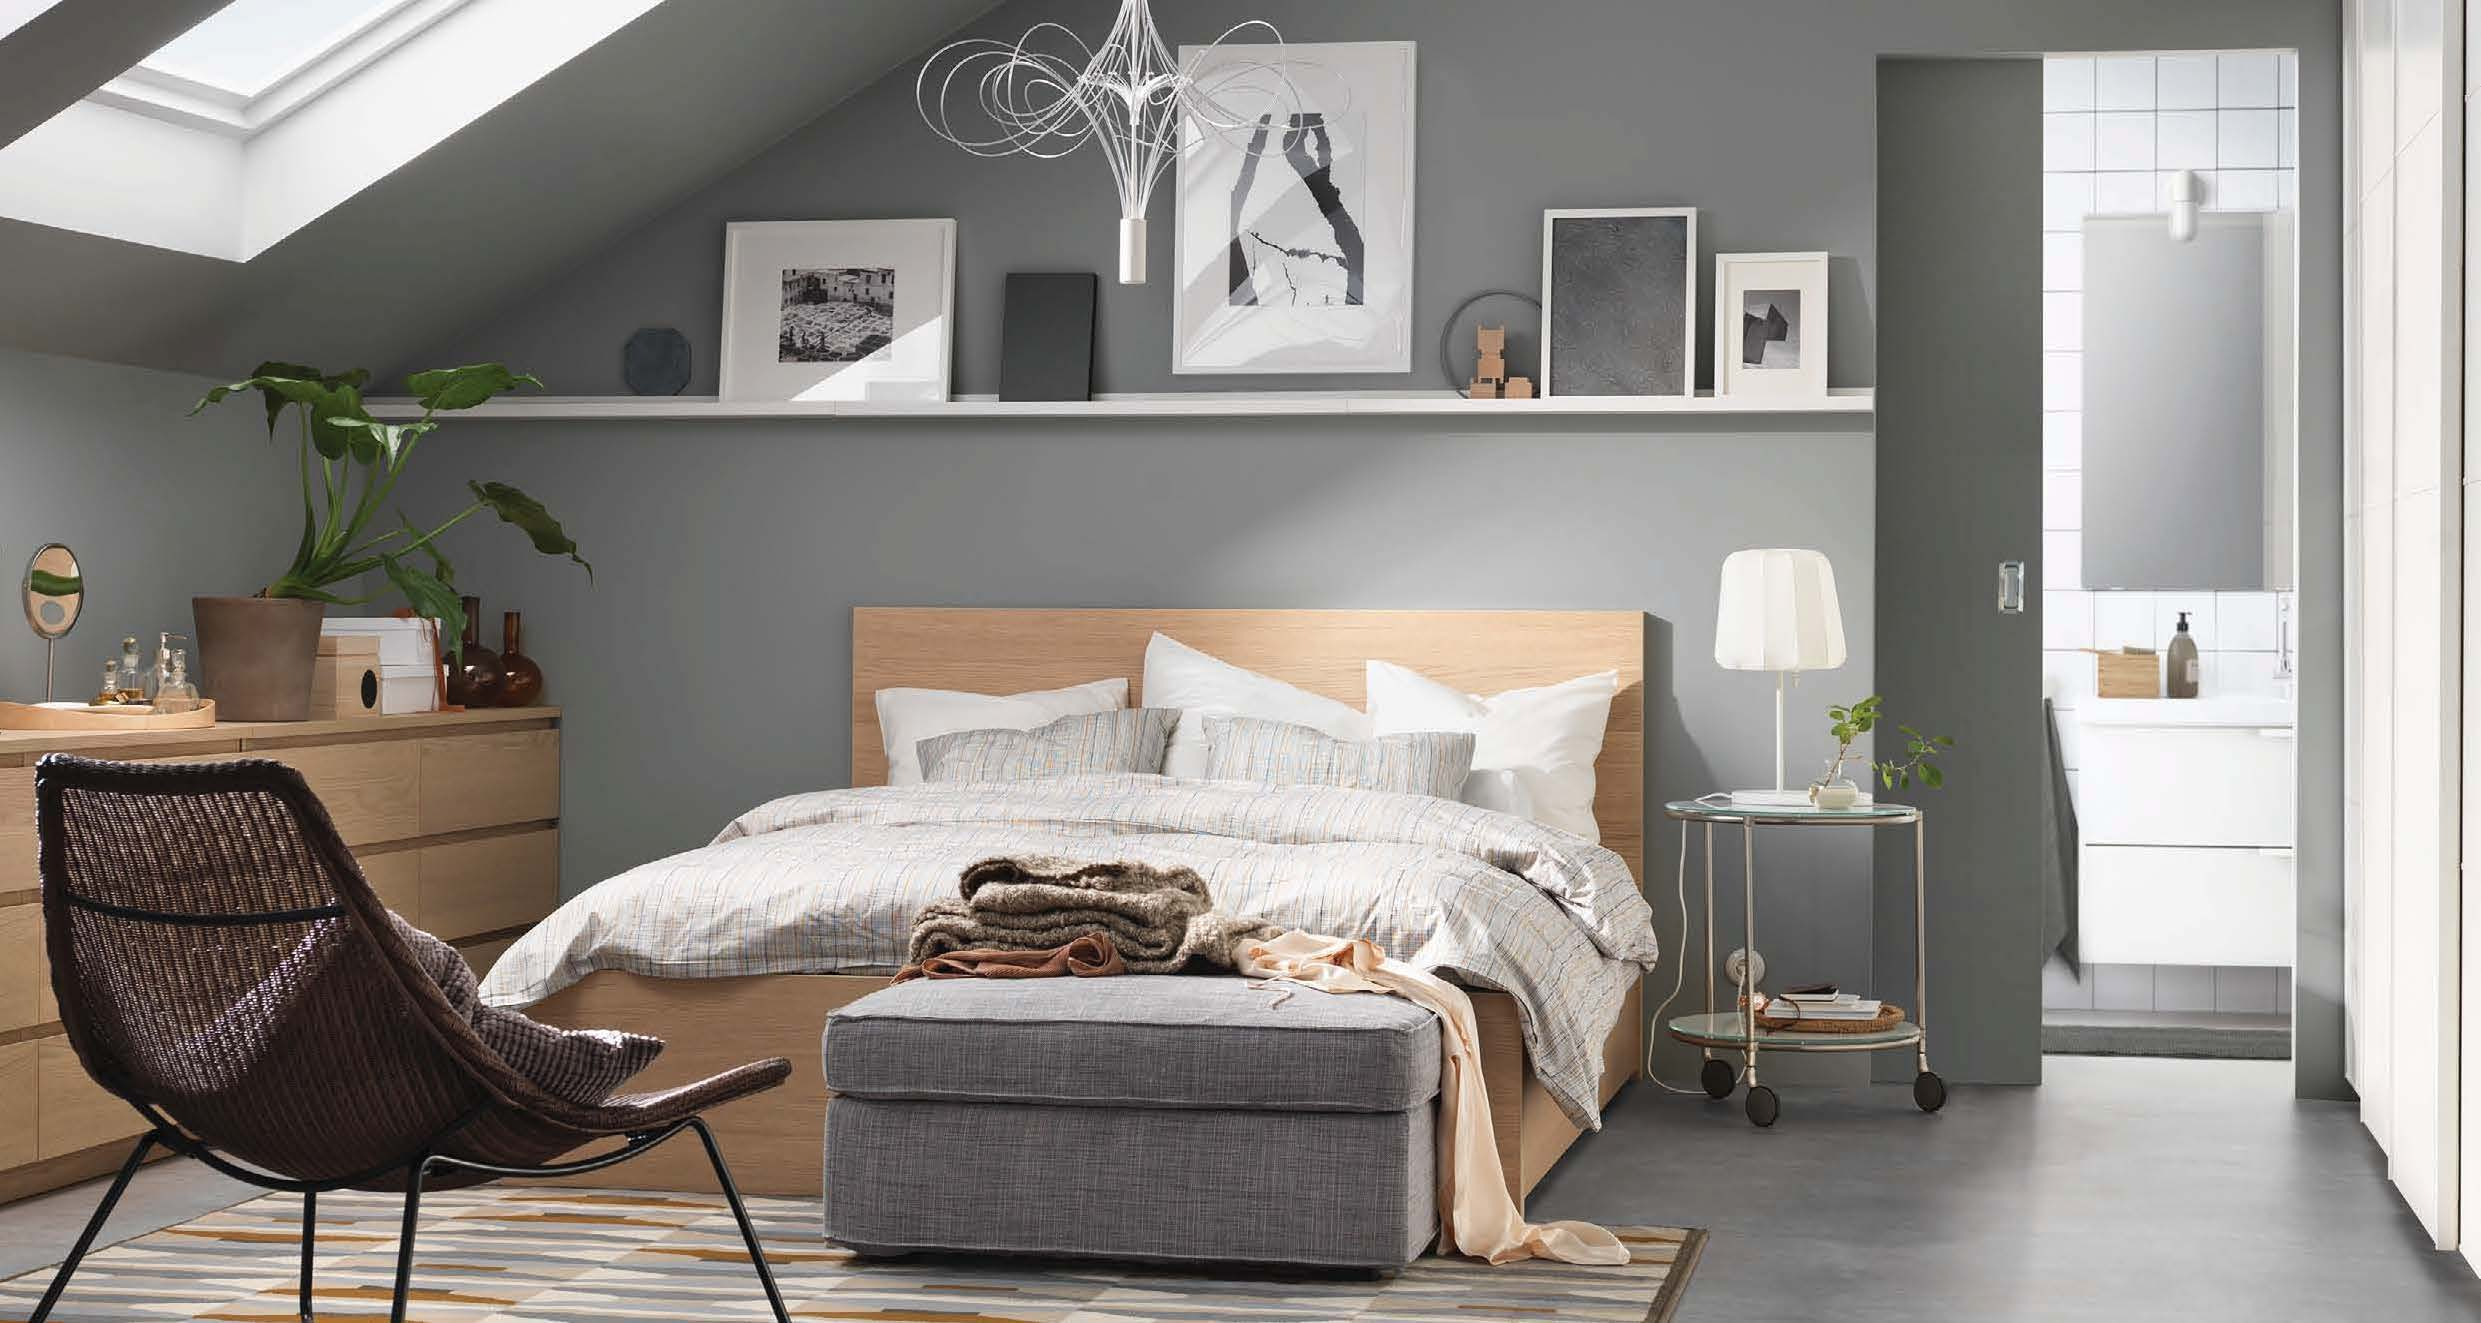 ikea 2016 catalog. Black Bedroom Furniture Sets. Home Design Ideas